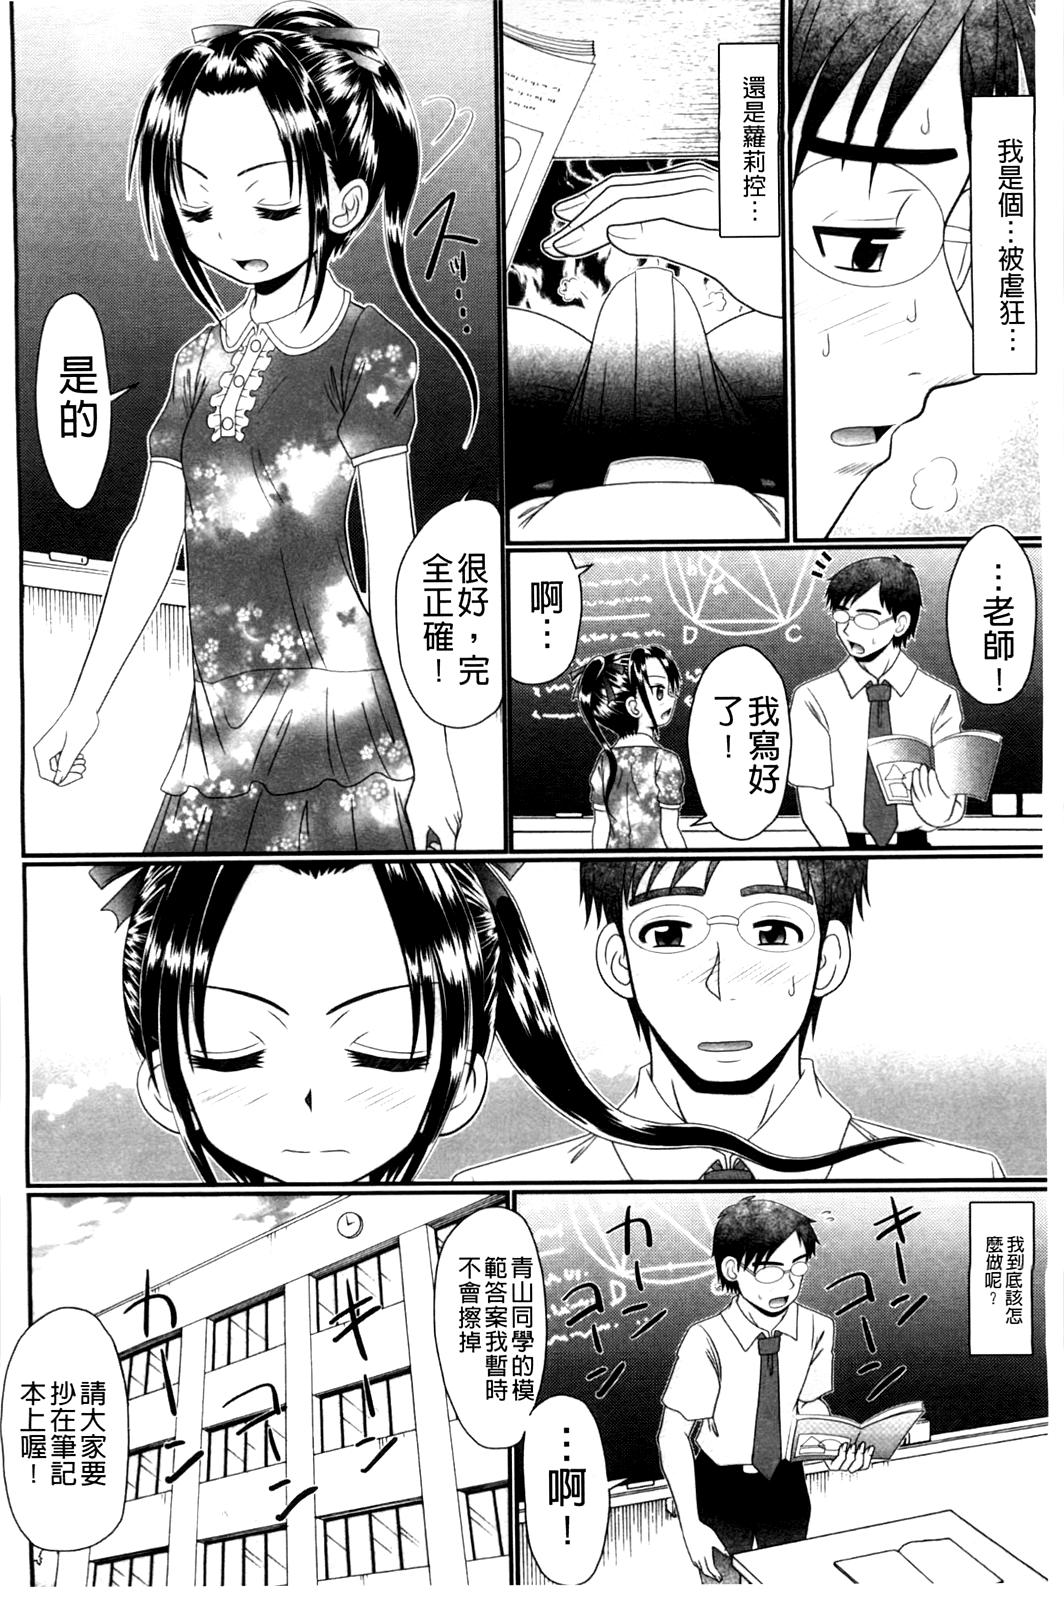 Higyaku Kyoushitsu 12